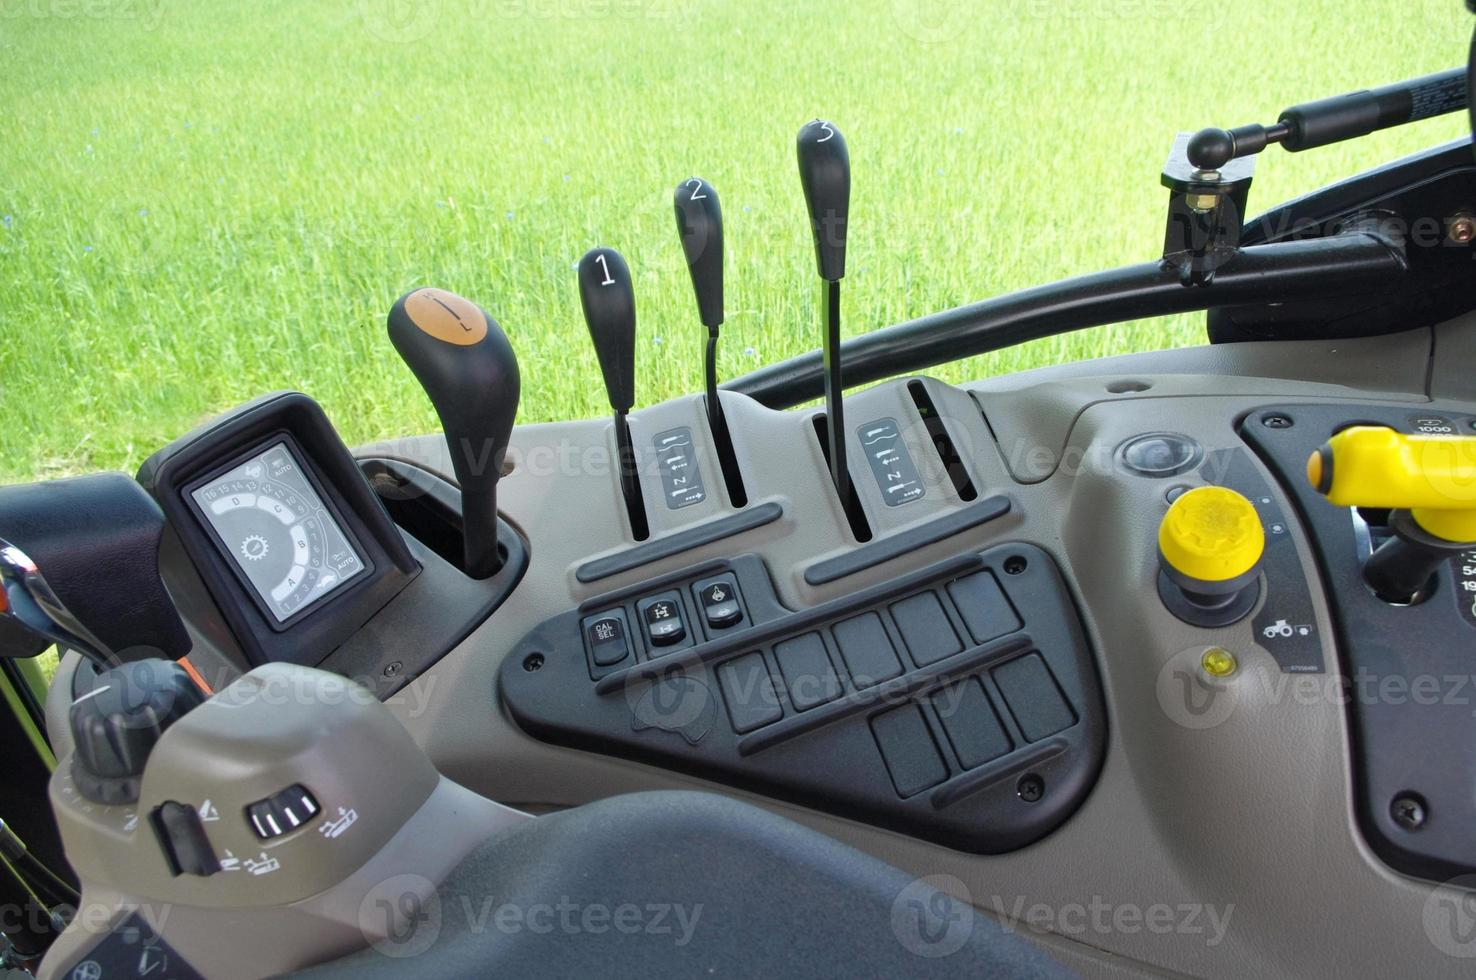 Traktorkabinengerät, Ausrüstung foto